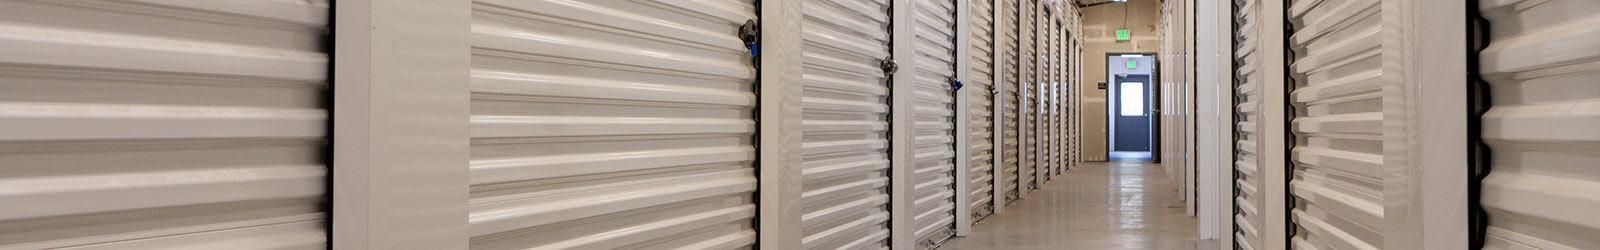 At Palouse Self Storage, we offer boat & RV storage in Spokane, WA.